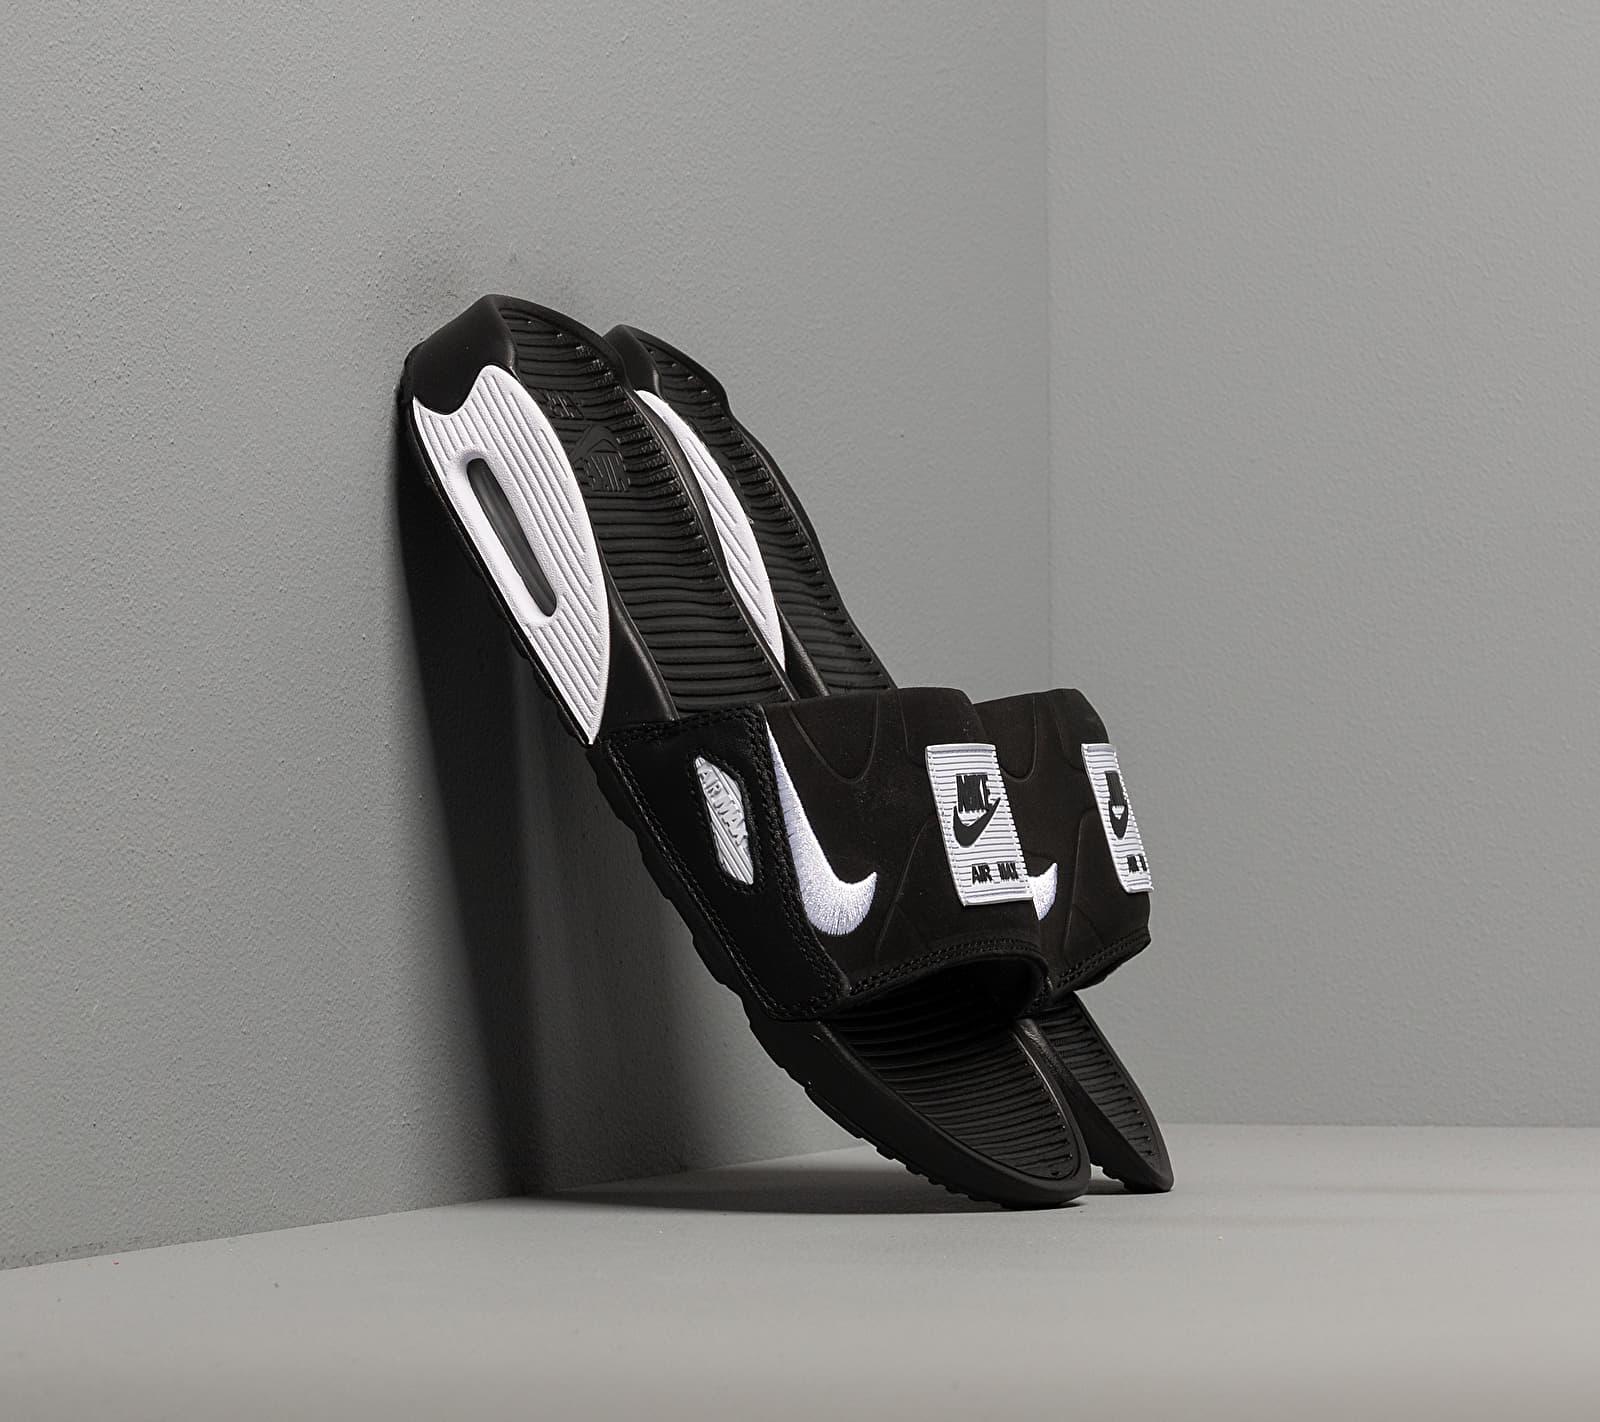 Nike Wmns Air Max 90 Slide Black/ White EUR 36.5